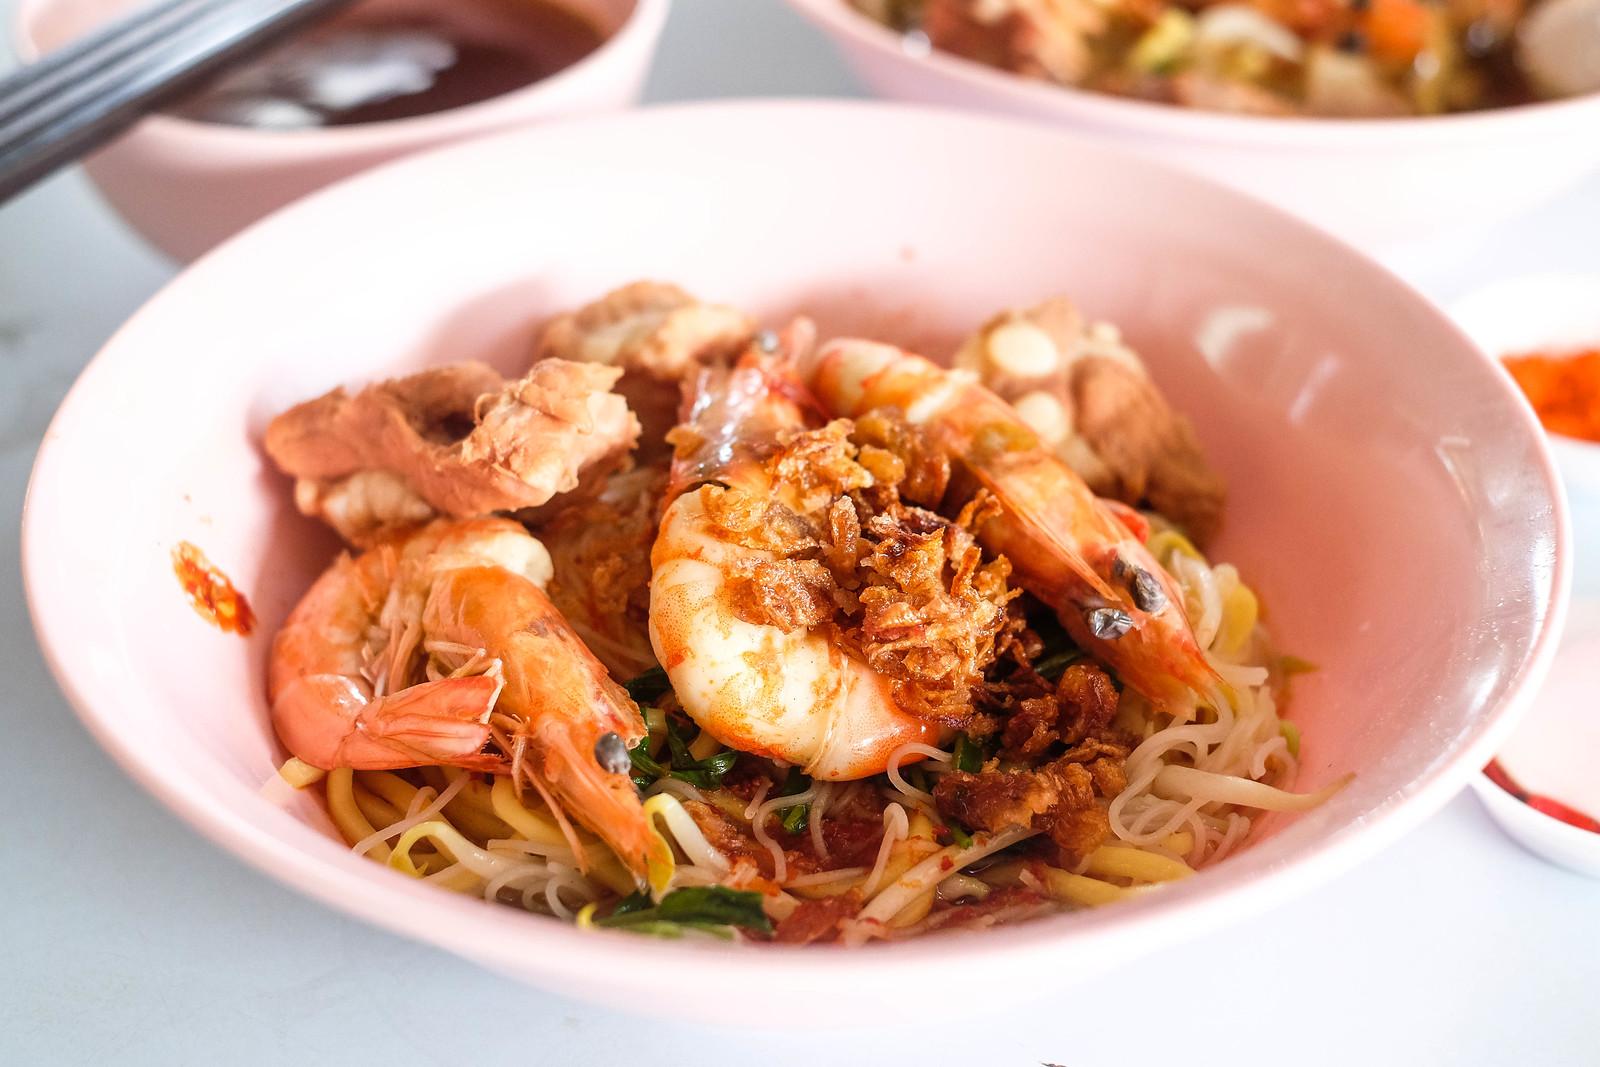 A bowl of Prawn Mee from Joo Chiat Prawn Mee